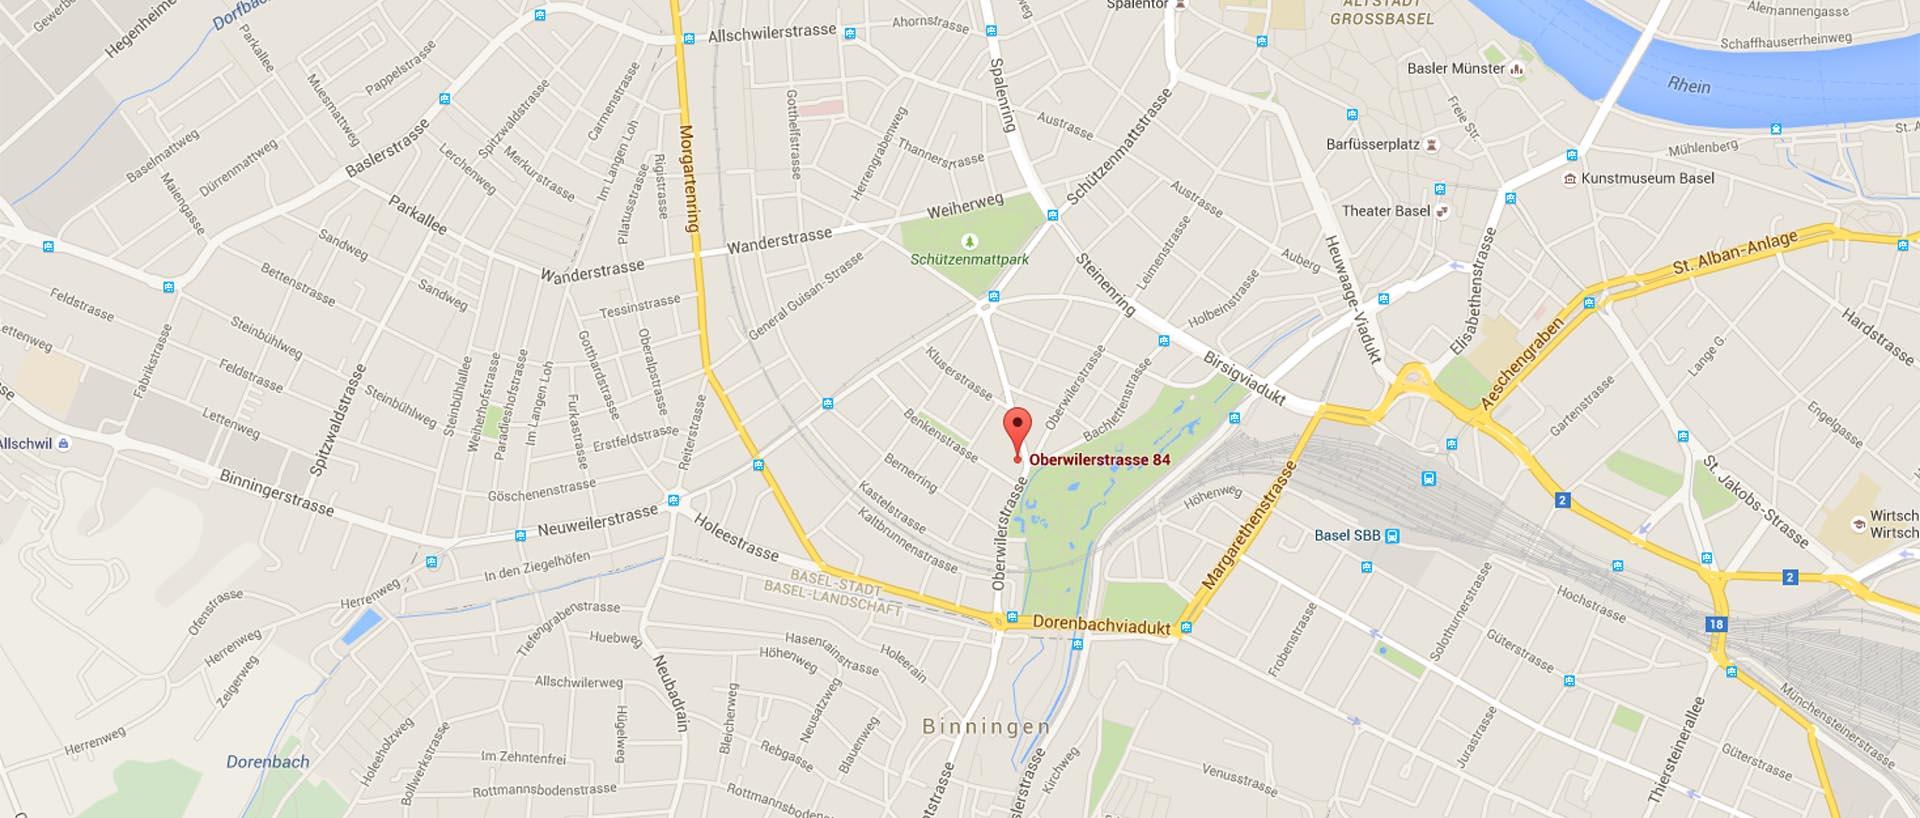 Oberwilerstrasse 84 - Google Maps